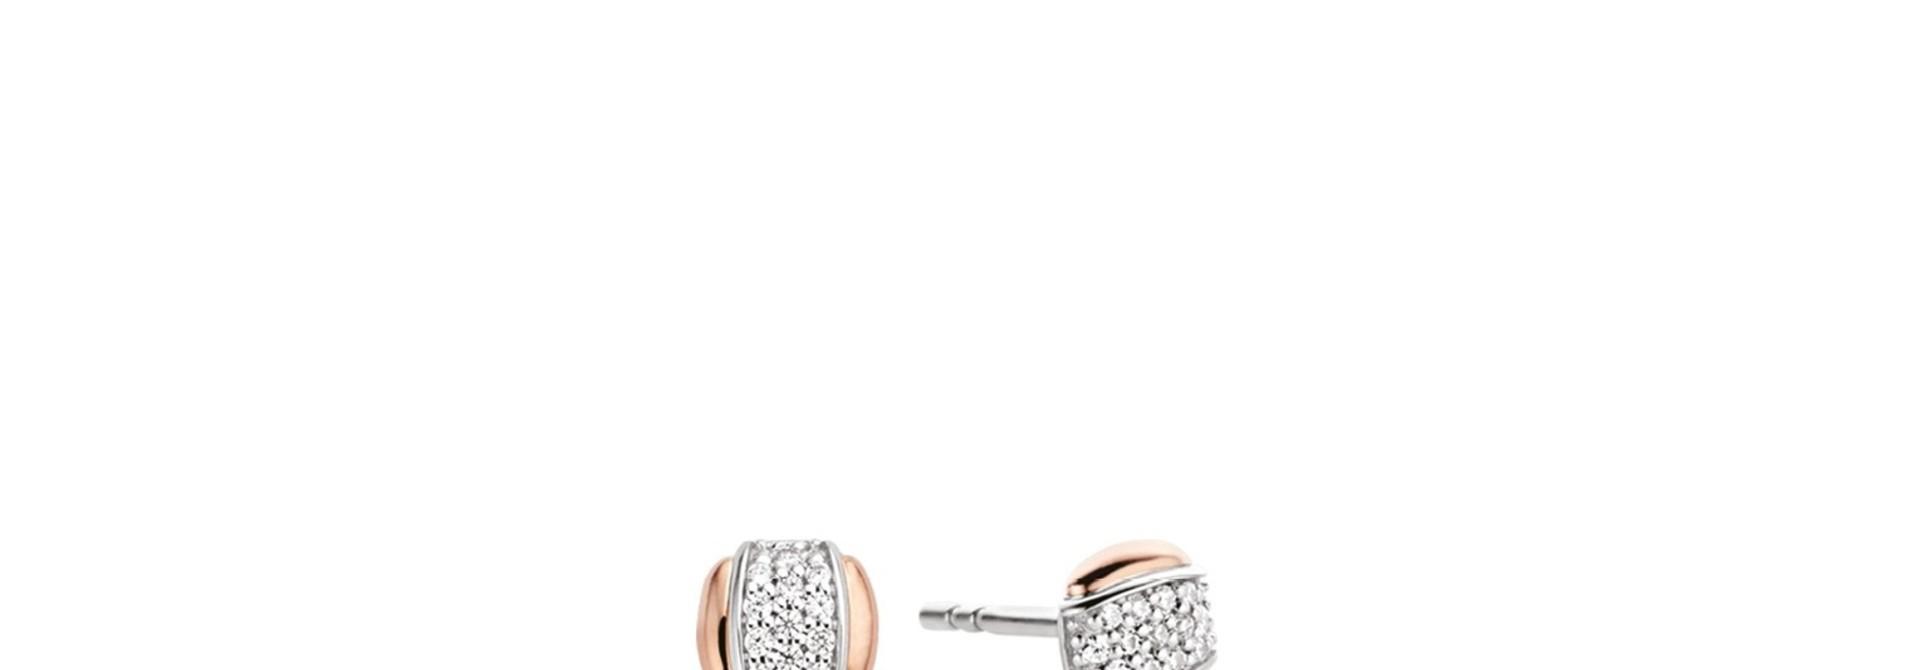 TI SENTO - Milano Earrings 7799ZR